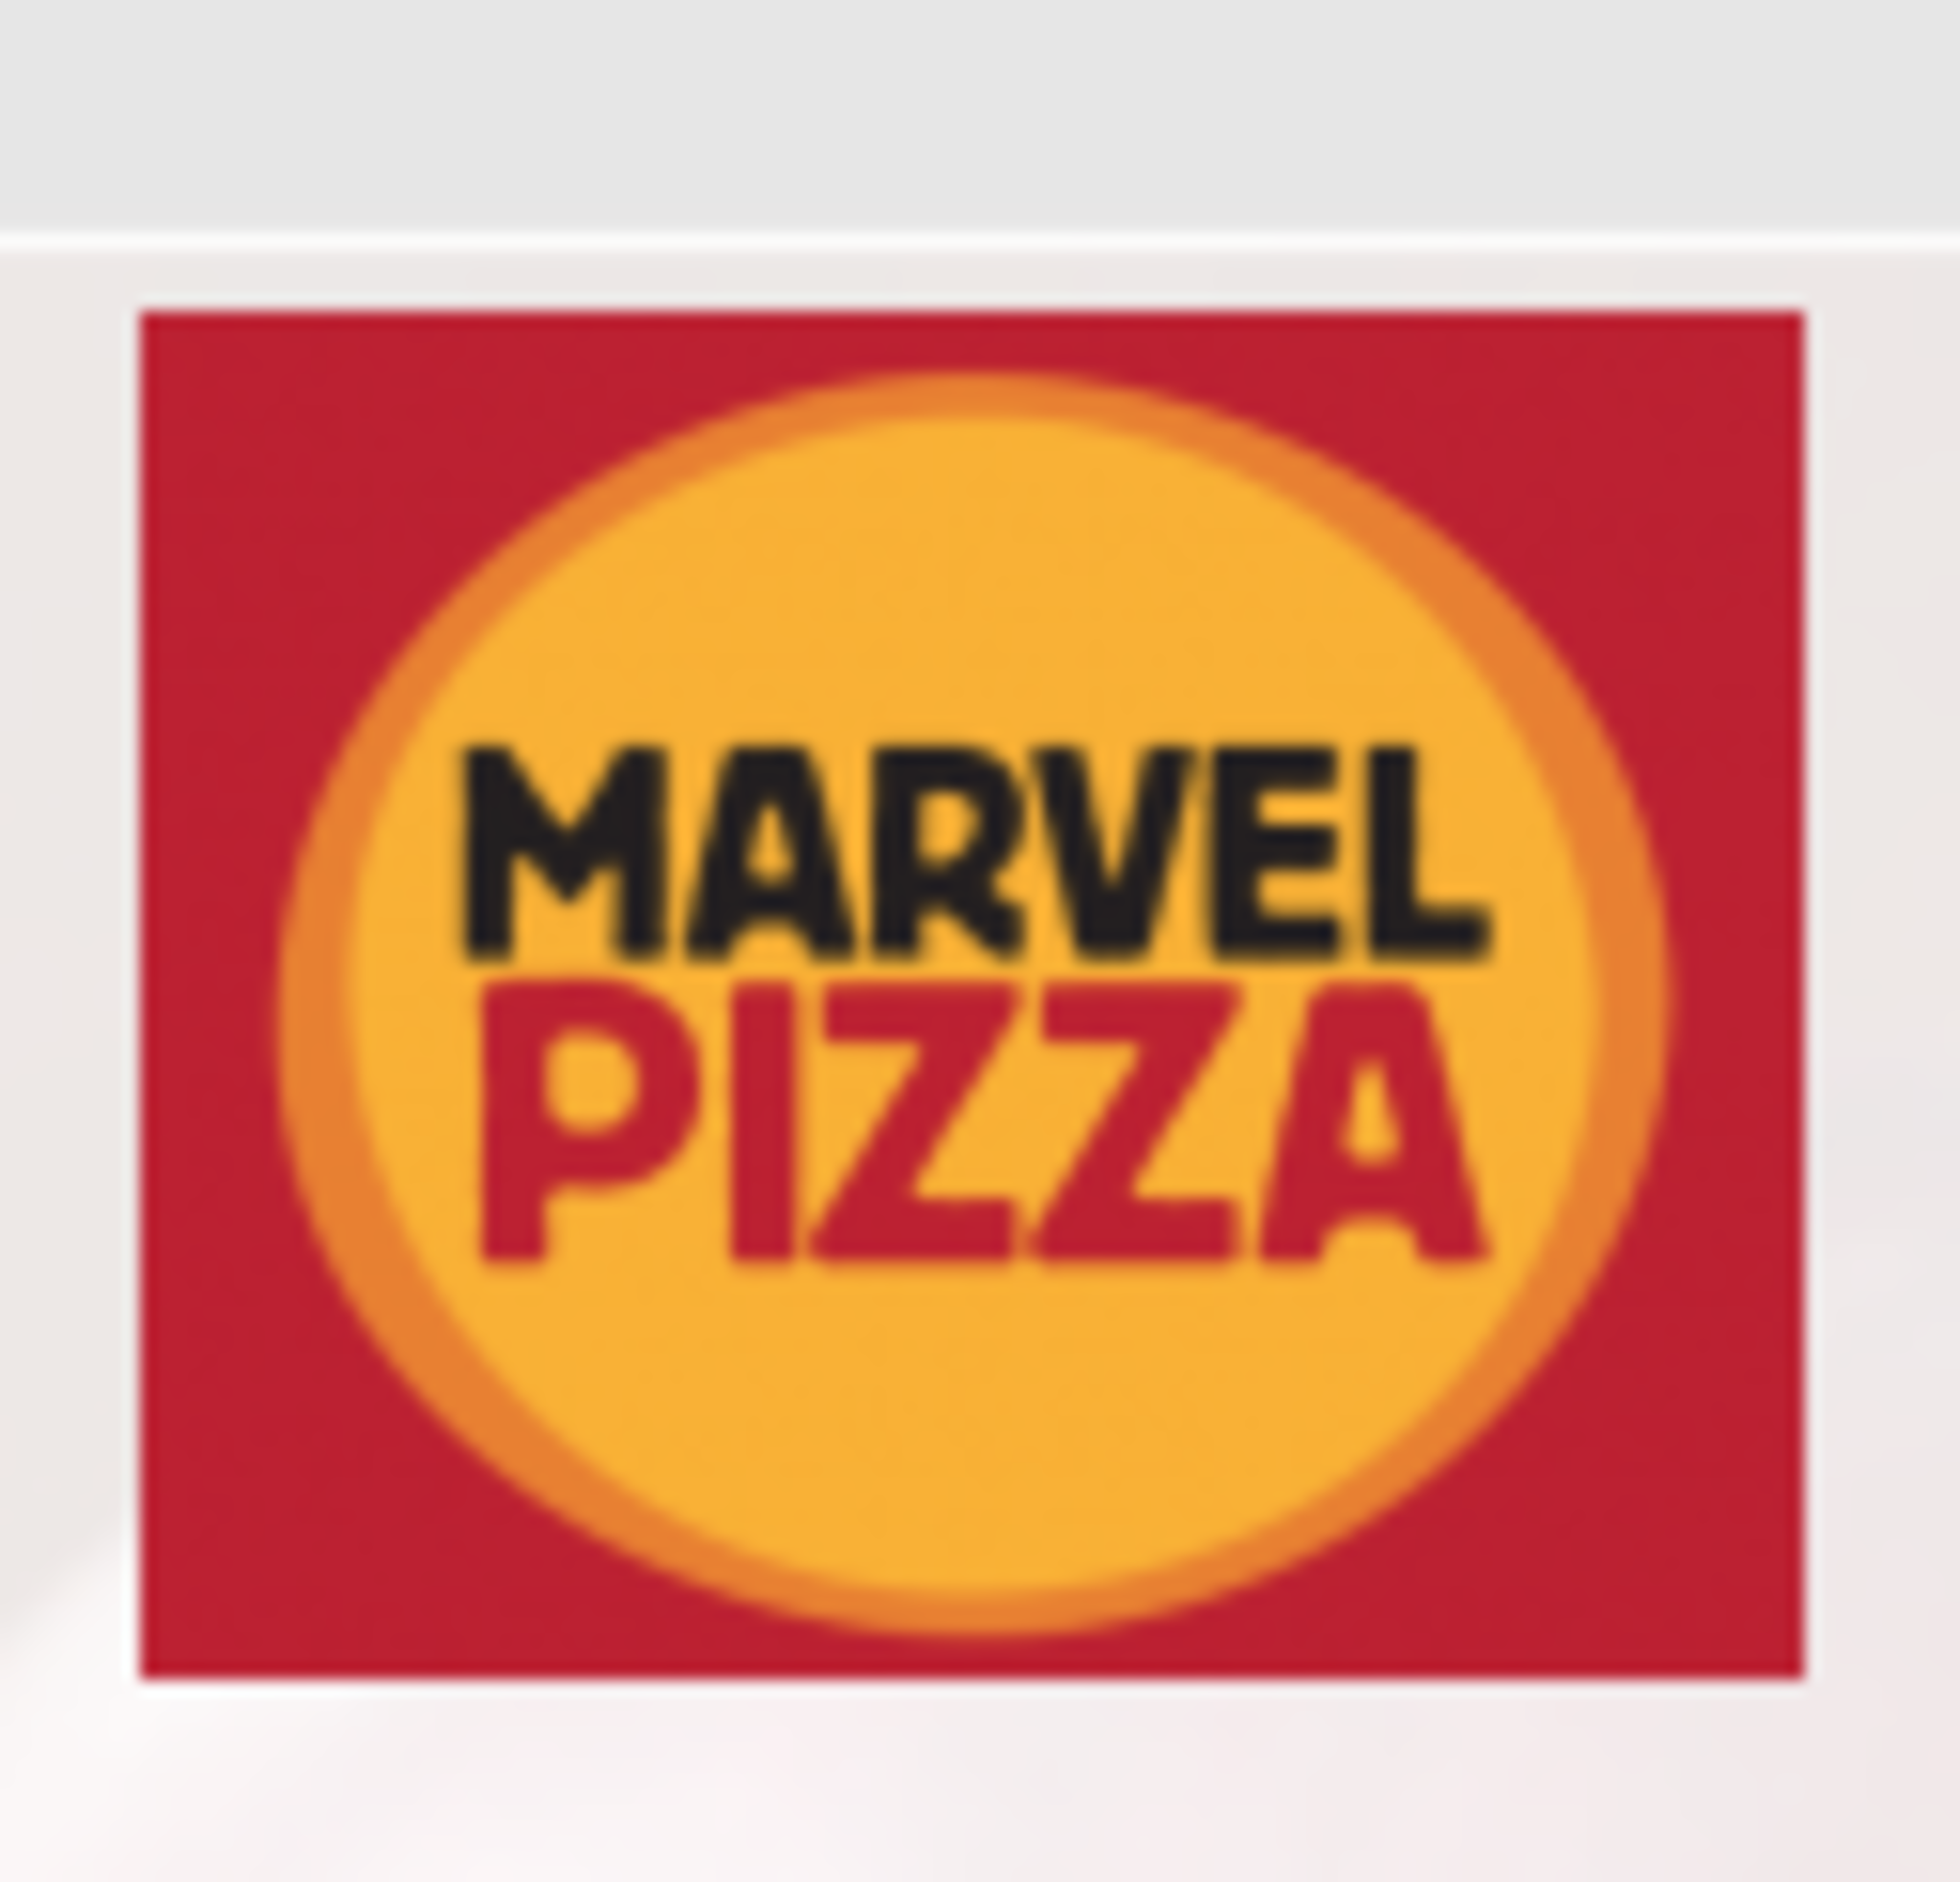 Marvel Pizza